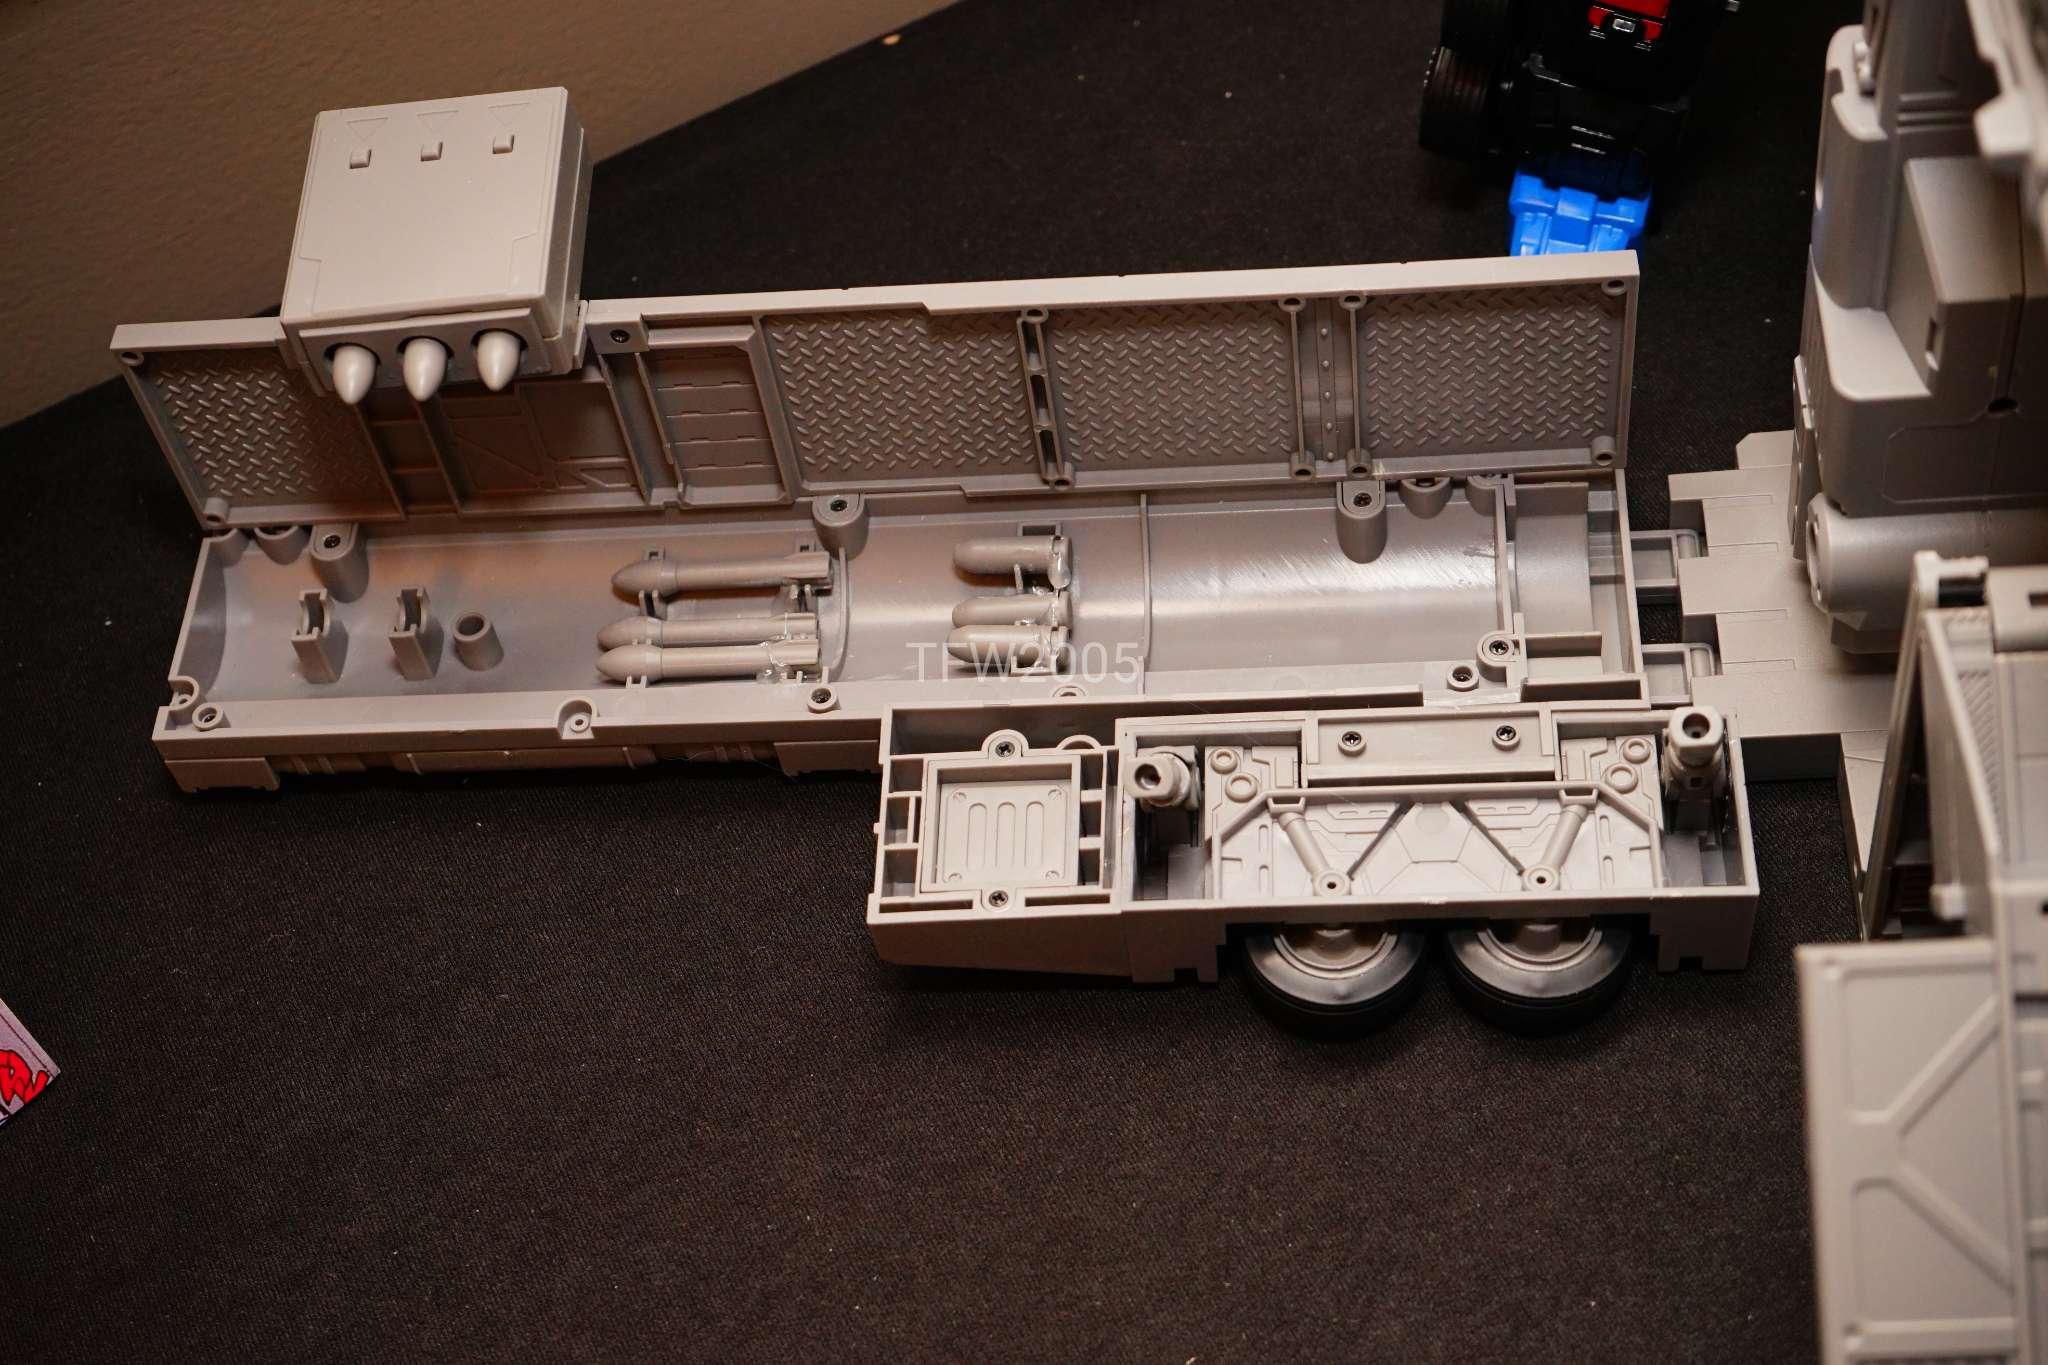 [FansHobby] Produit Tiers - Master Builder MB-01 Archenemy (aka Scourge RID 2000),  MB-04 Gunfighter II (aka Laser Optimus G2) et MB-09 Trailer (remorque) - Page 2 E2z9f7xt_o